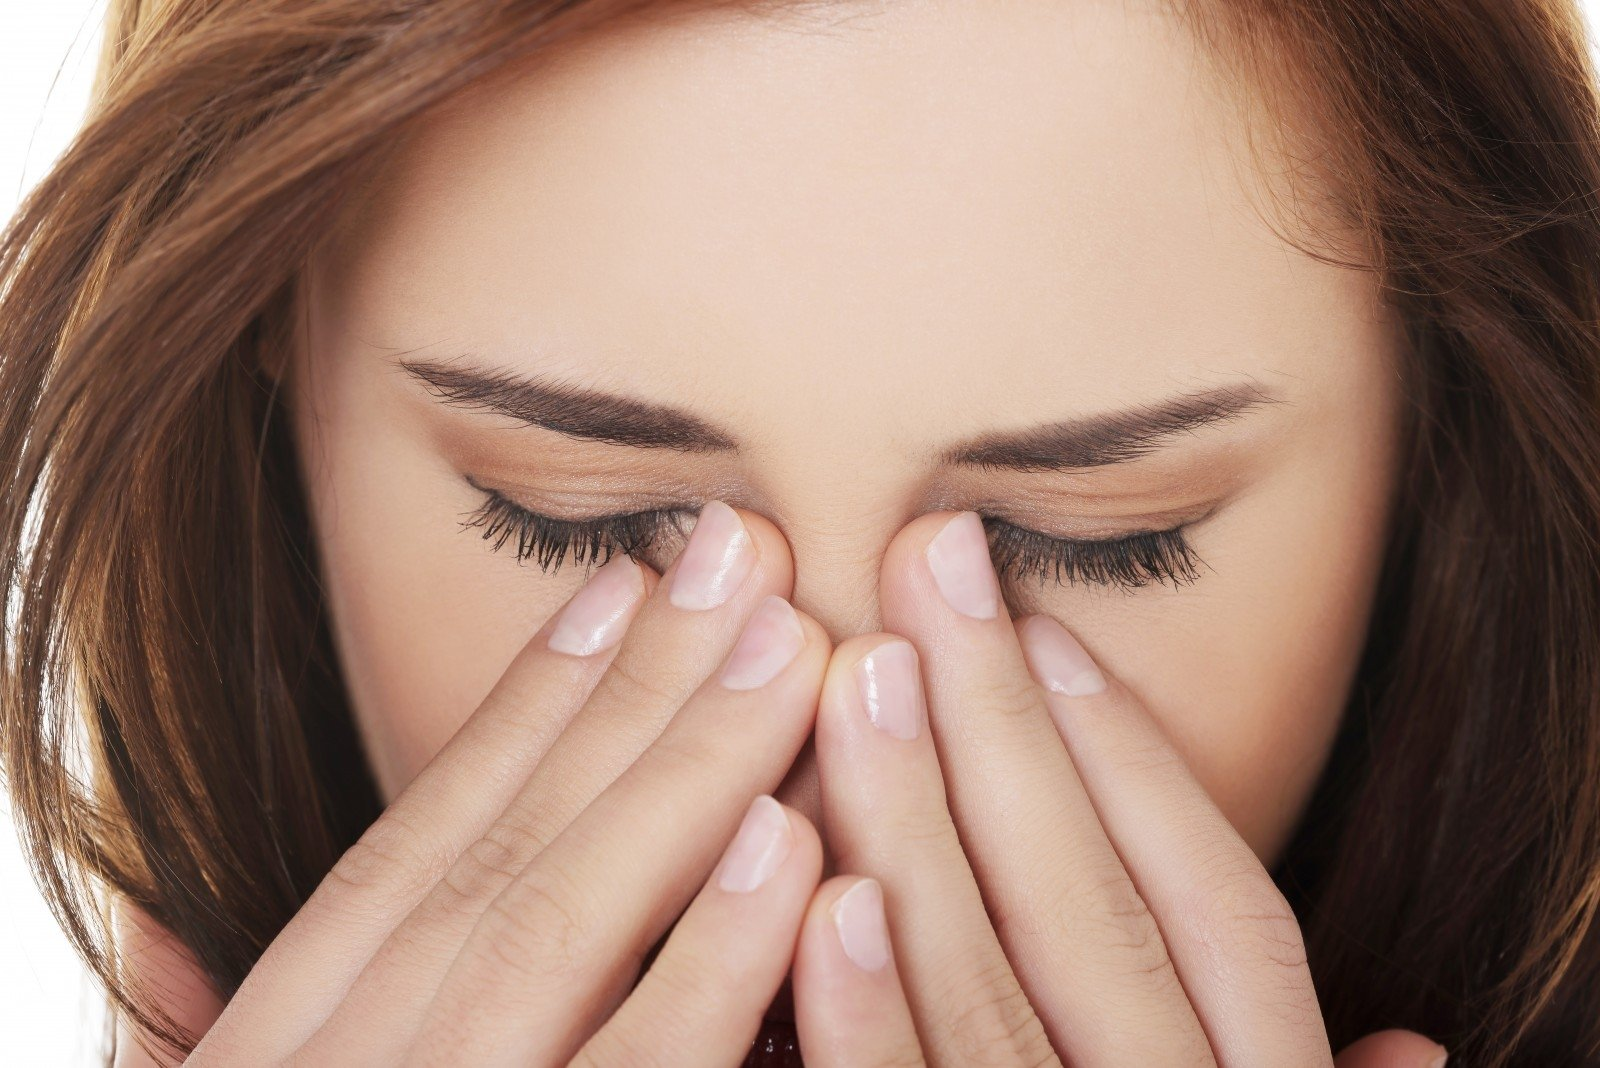 hipertenzija skauda akį hipertenzija su nervų sistemos pažeidimu